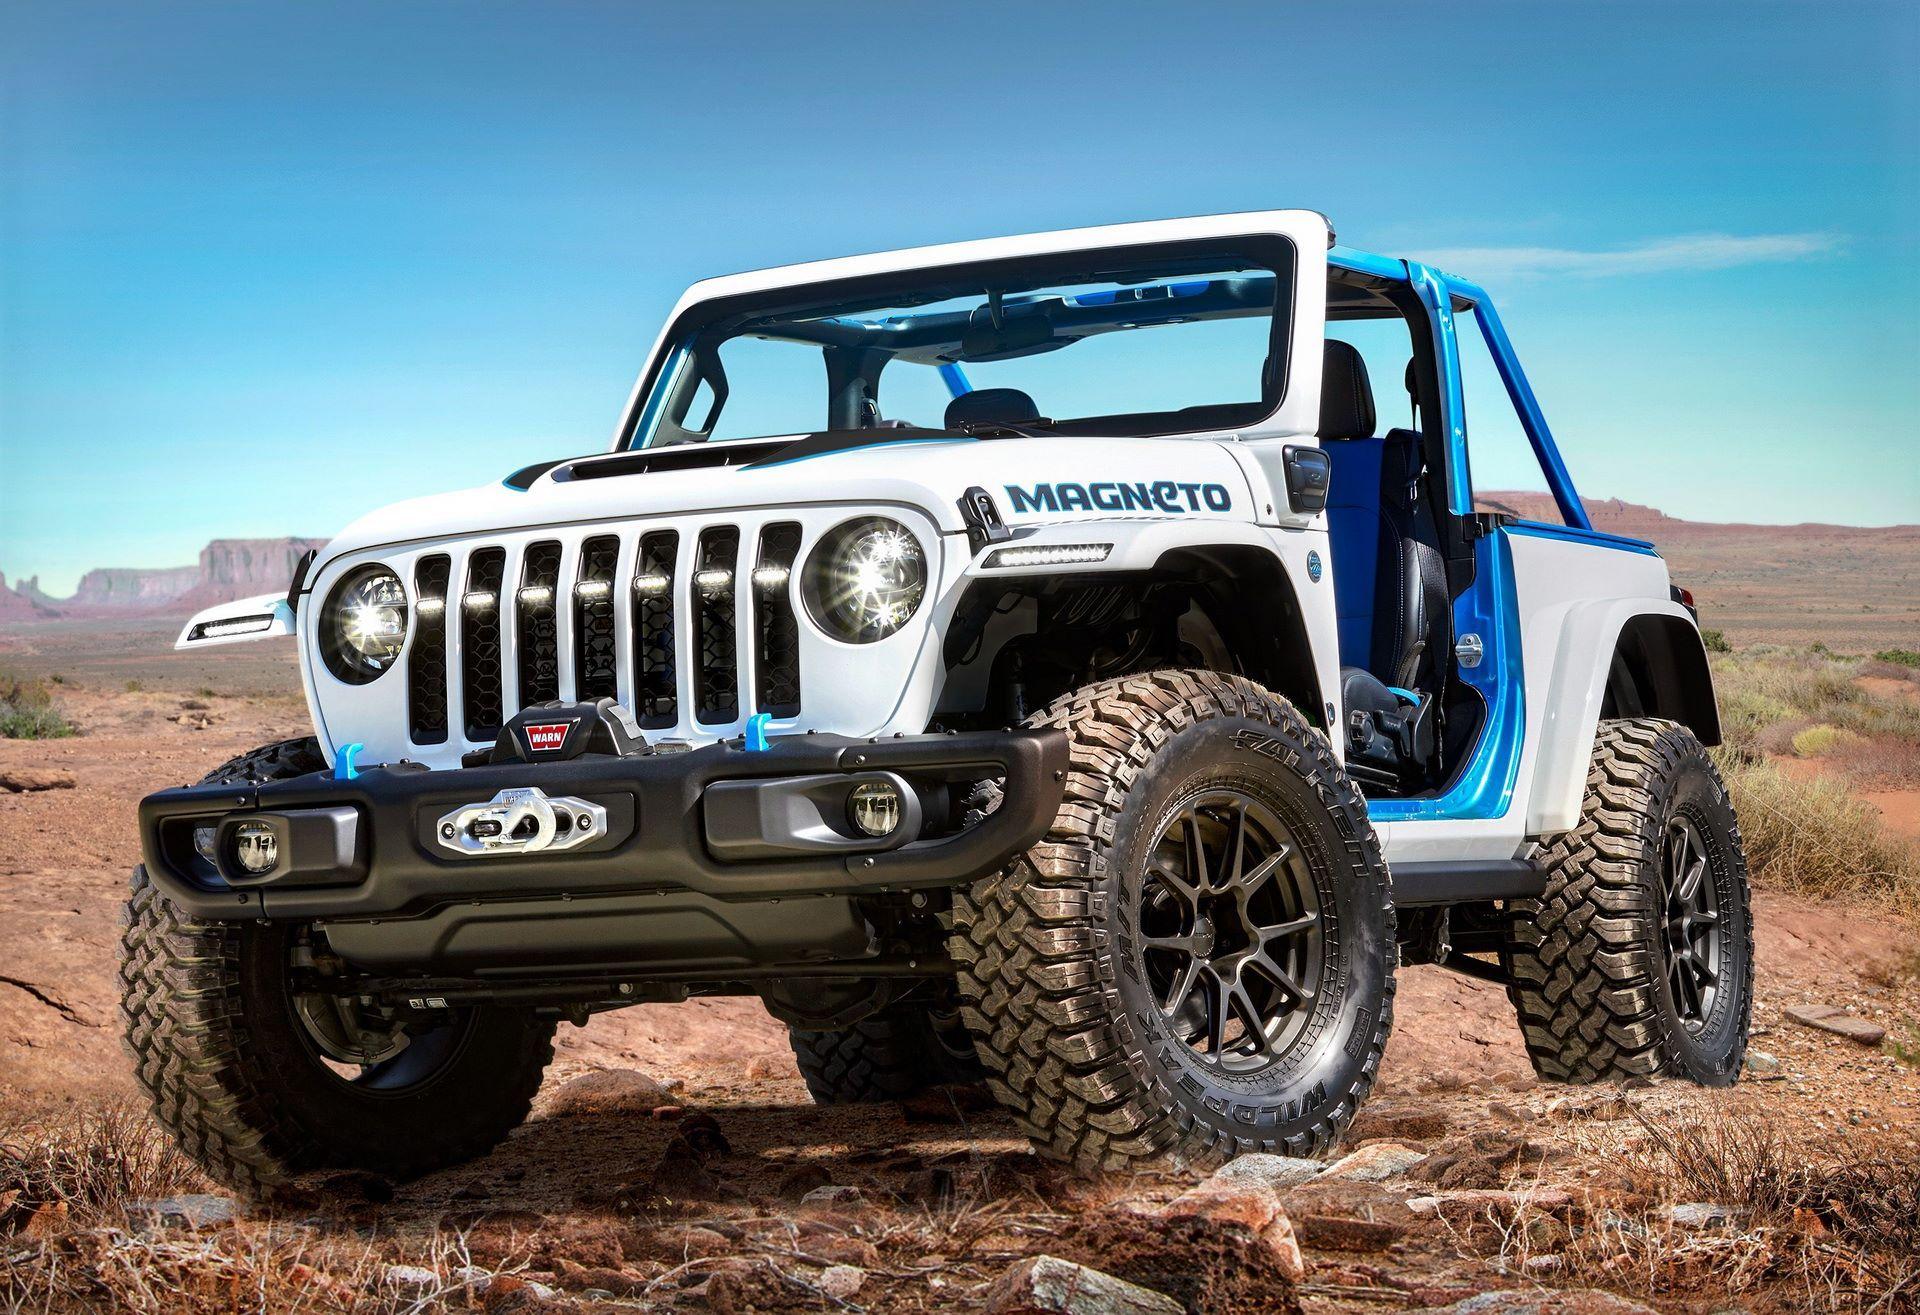 2020-jeep-wrangler-magneto-electric-concept-1